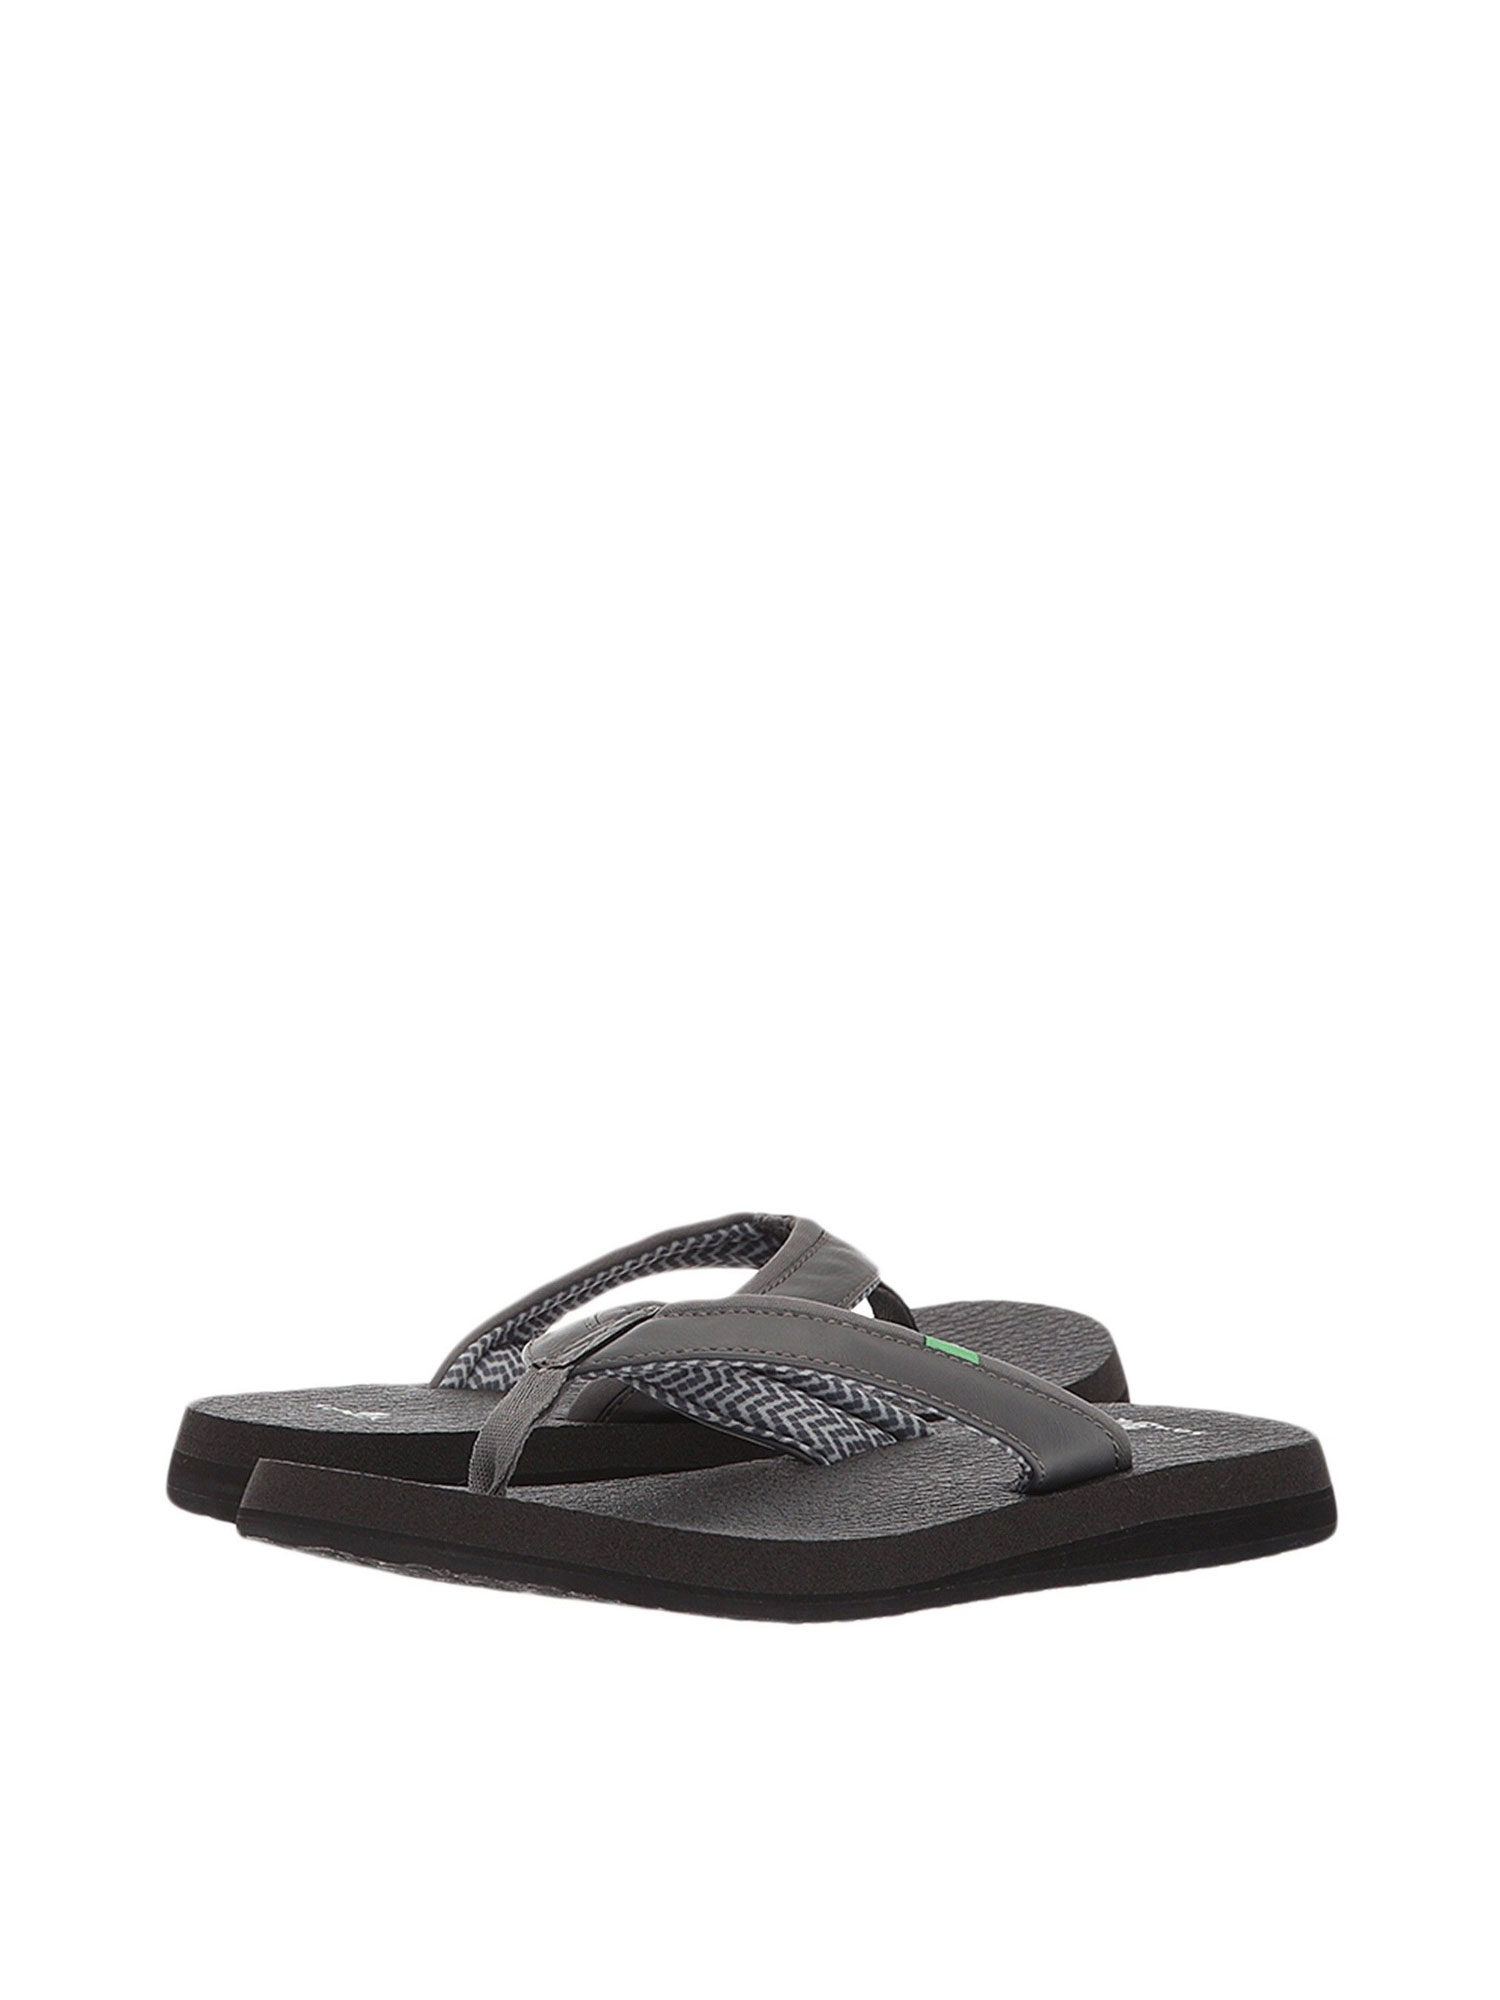 Sanuk Yoga Mat 2 White Women/'s Casual Flip Flop Sandals 1091169